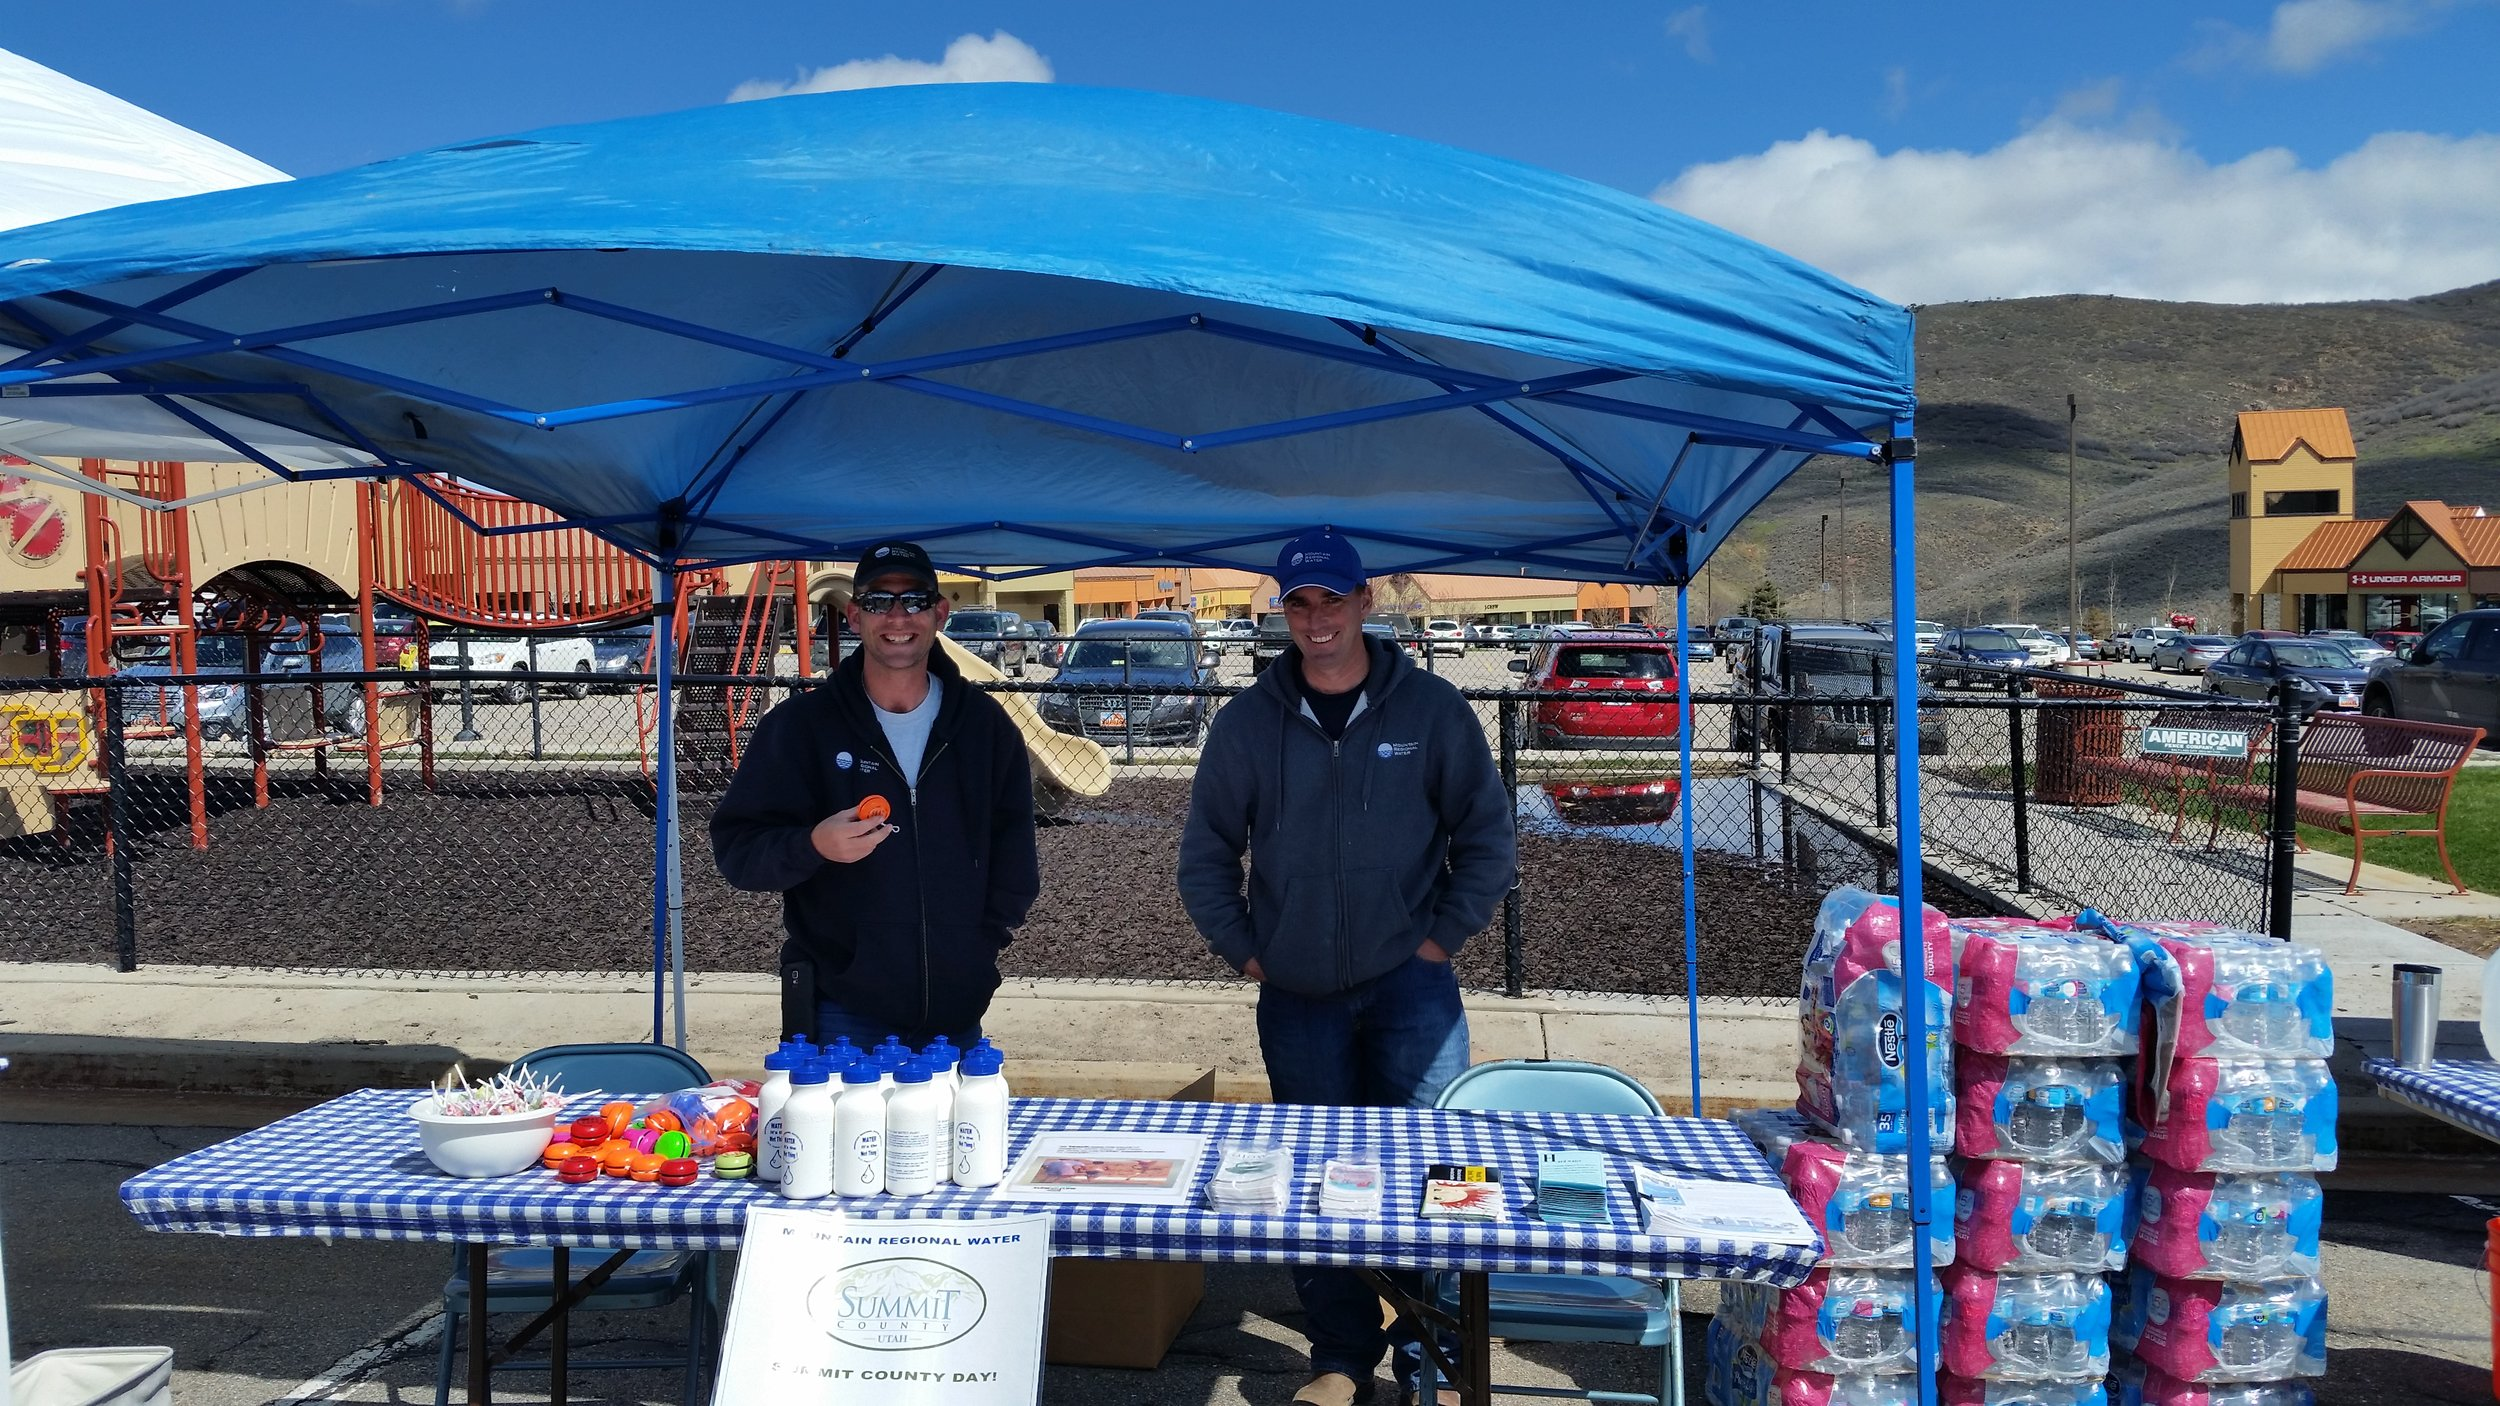 Operators at a local water fair.